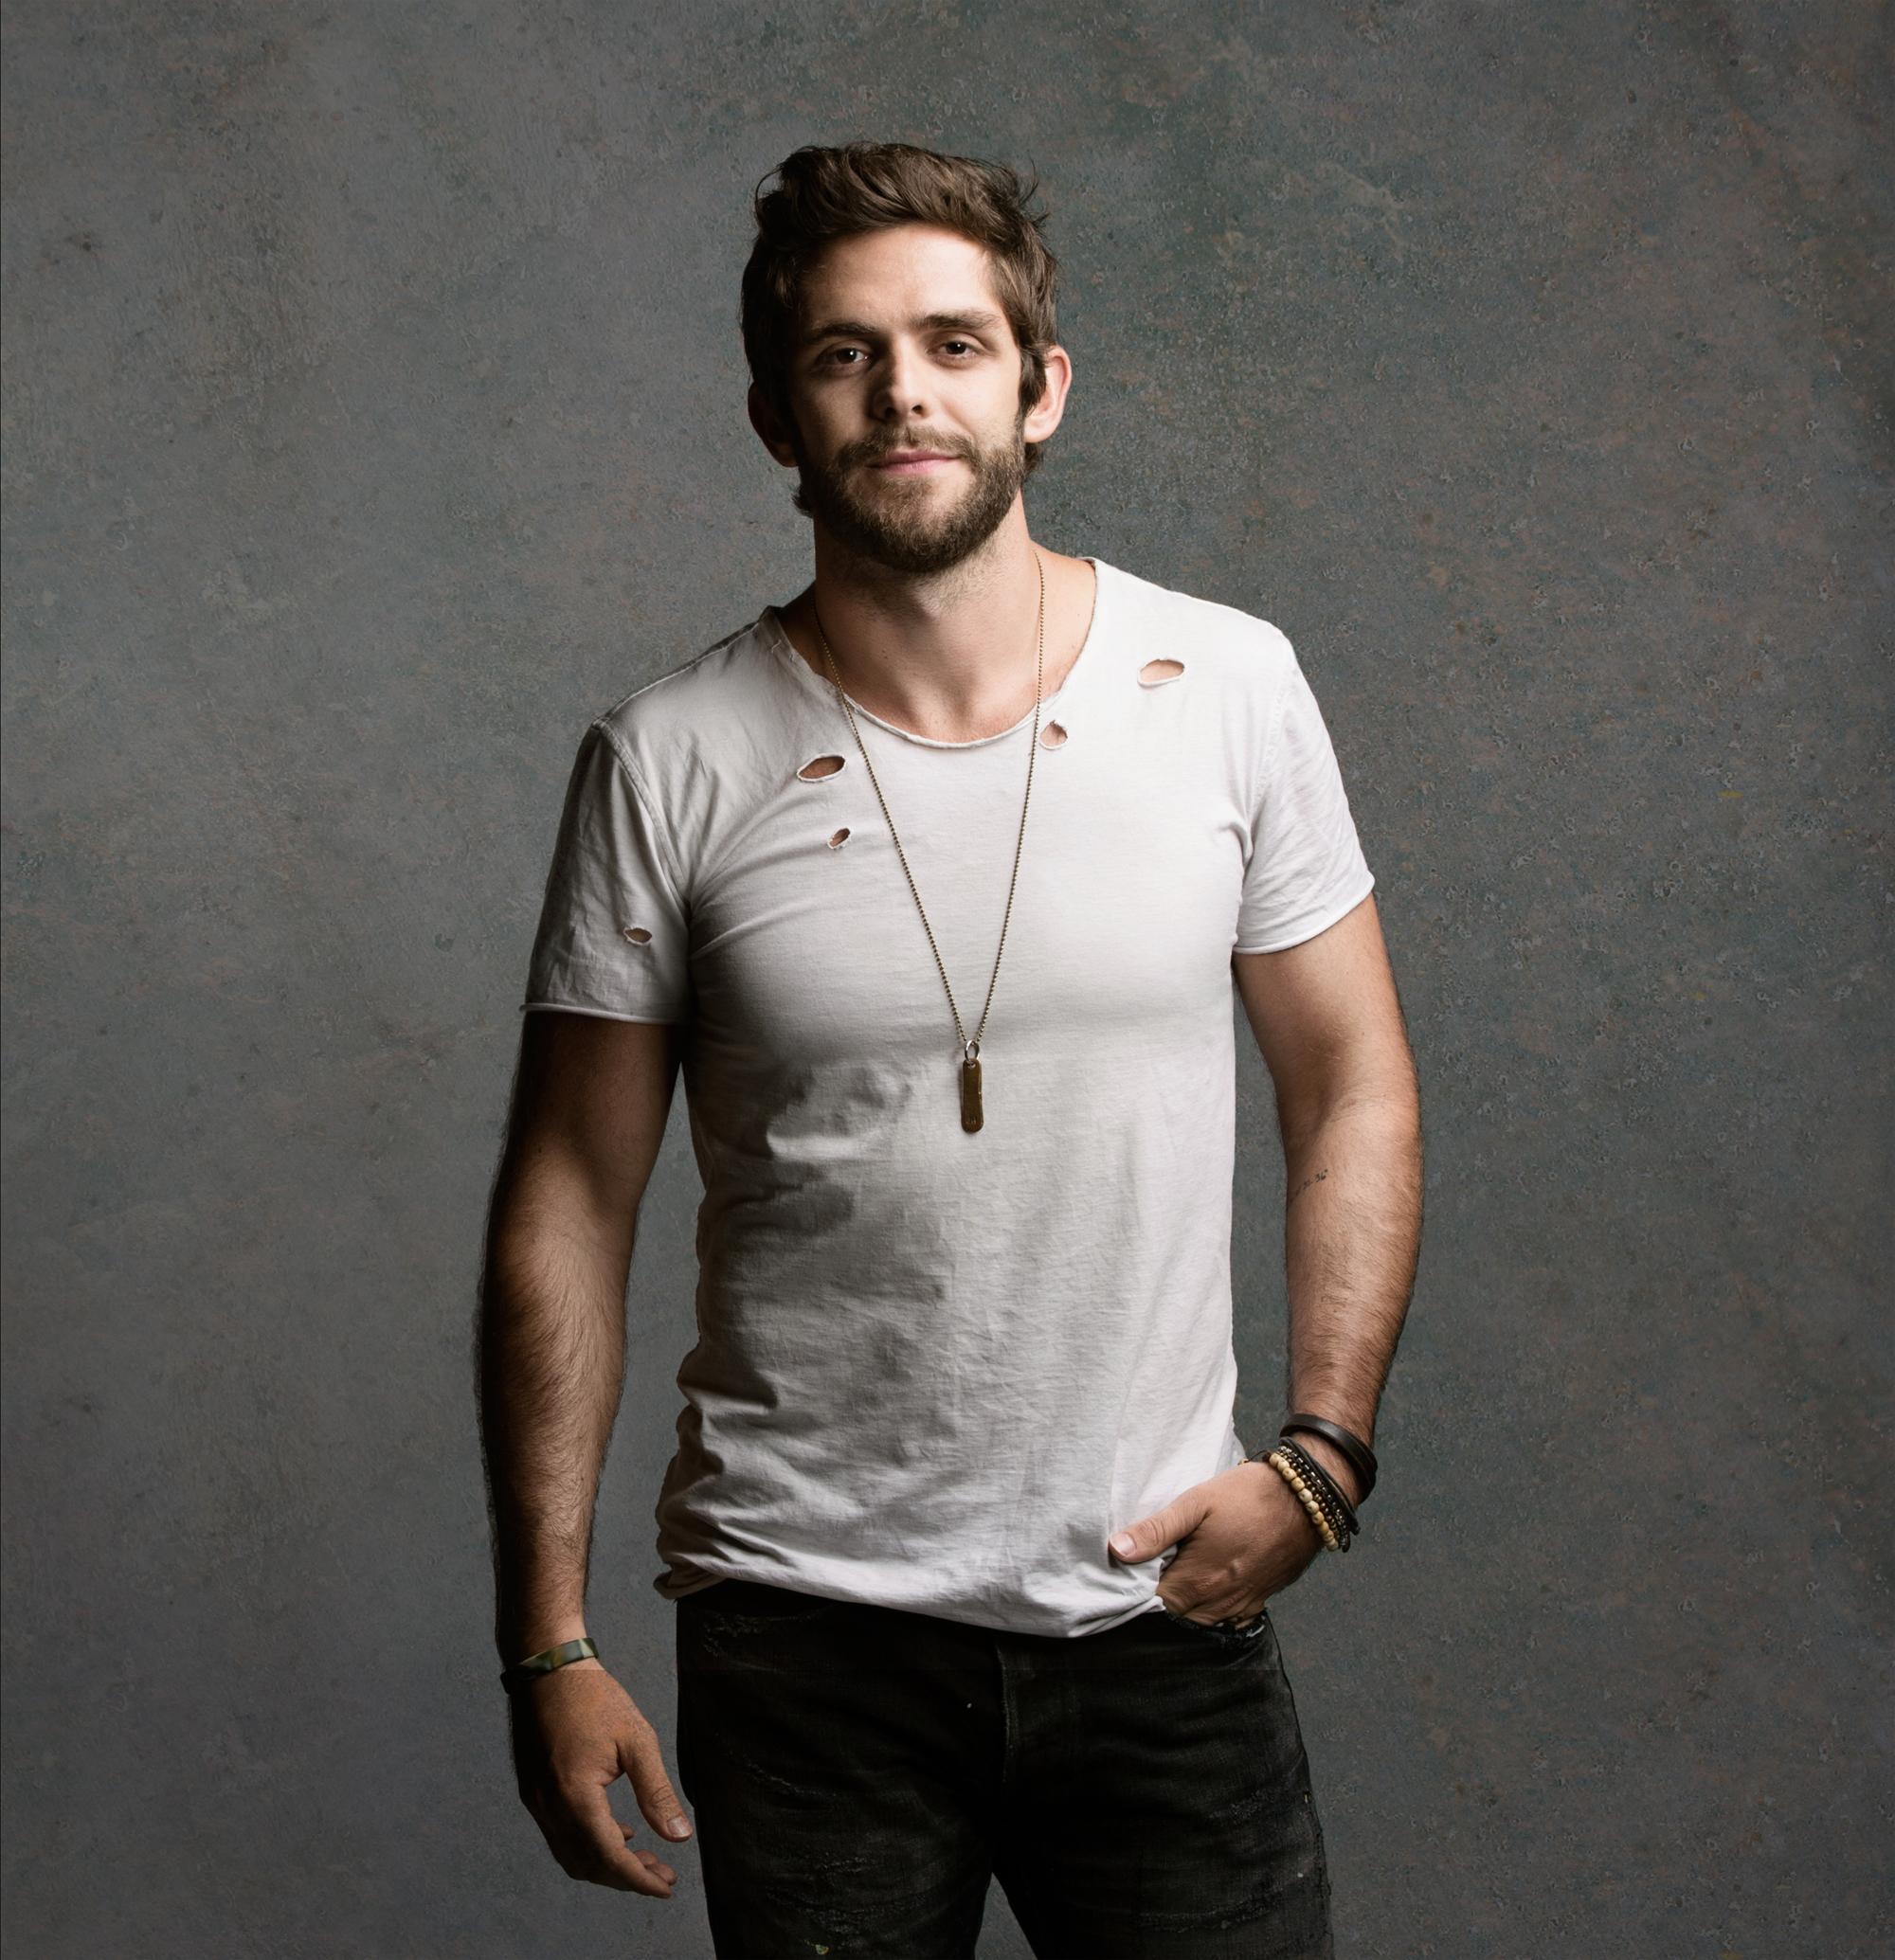 Rising country star Thomas Rhett playing at Mohegan Sun ...